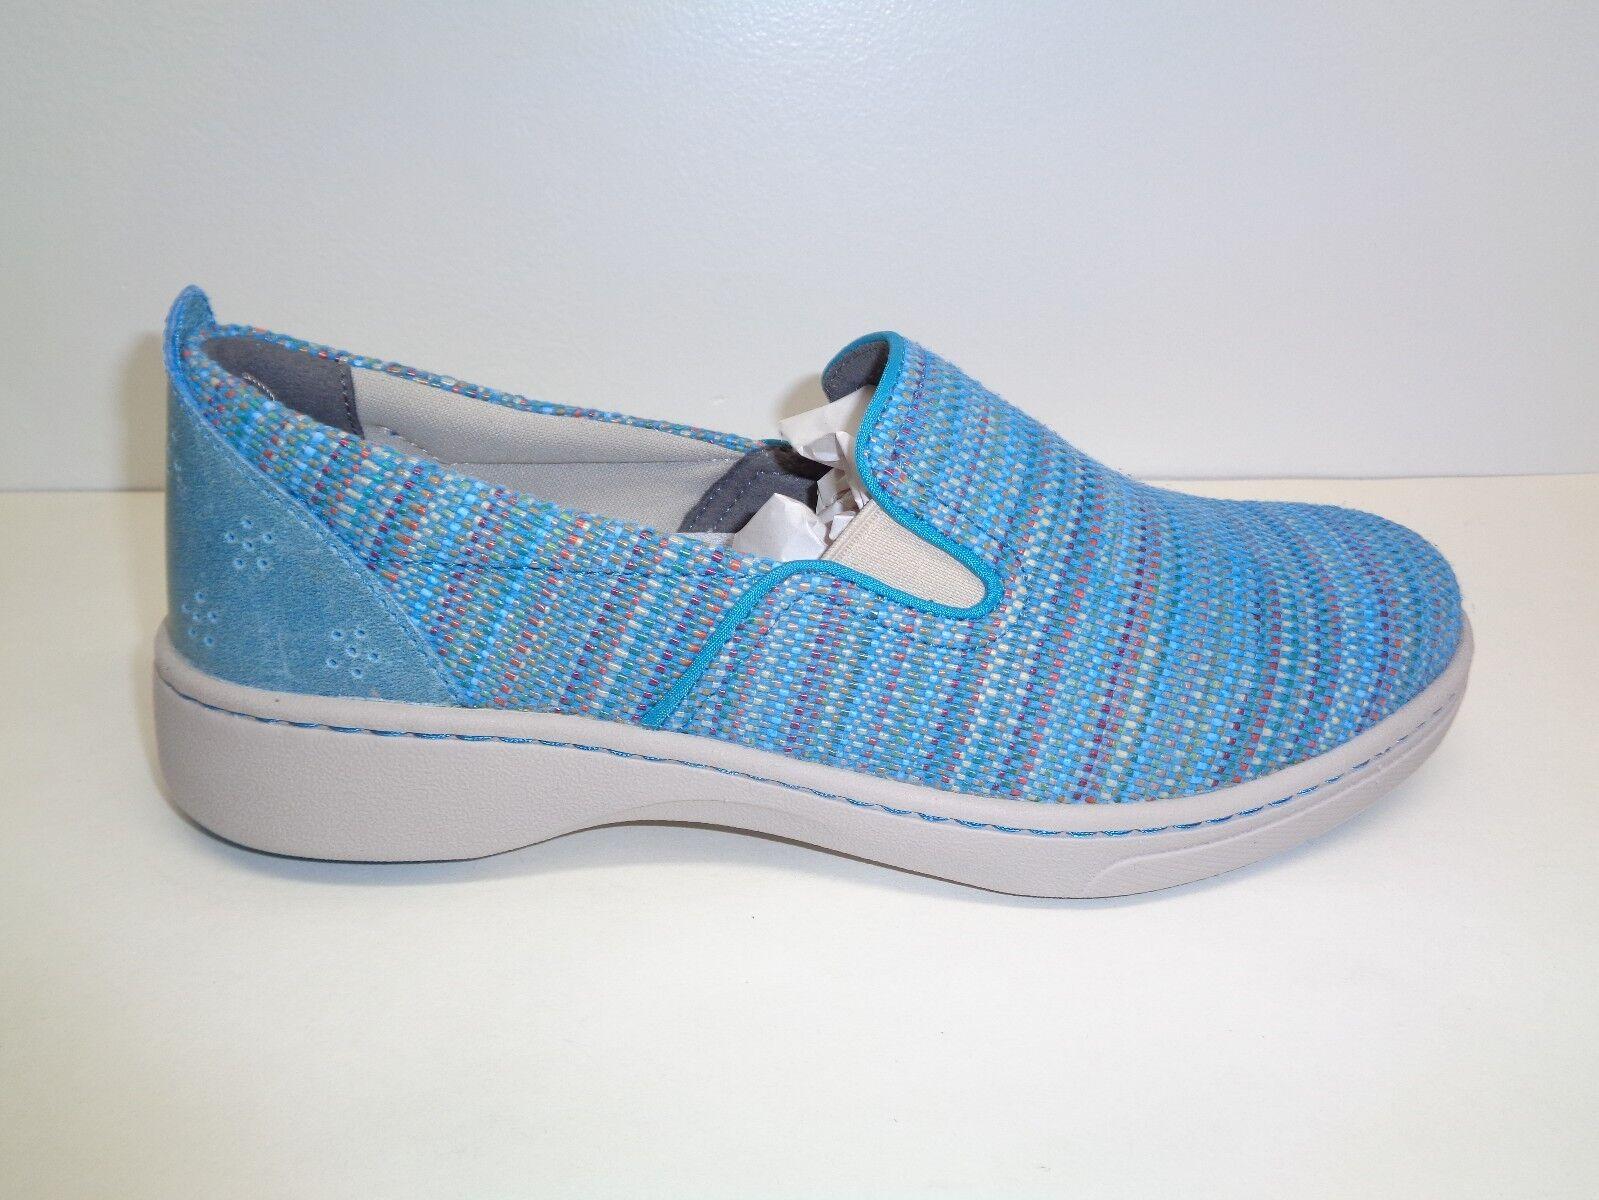 Dansko Größe 8.5 to 9 BELLE Blau Canvas Fashion Sneakers NEU Damenschuhe Schuhes